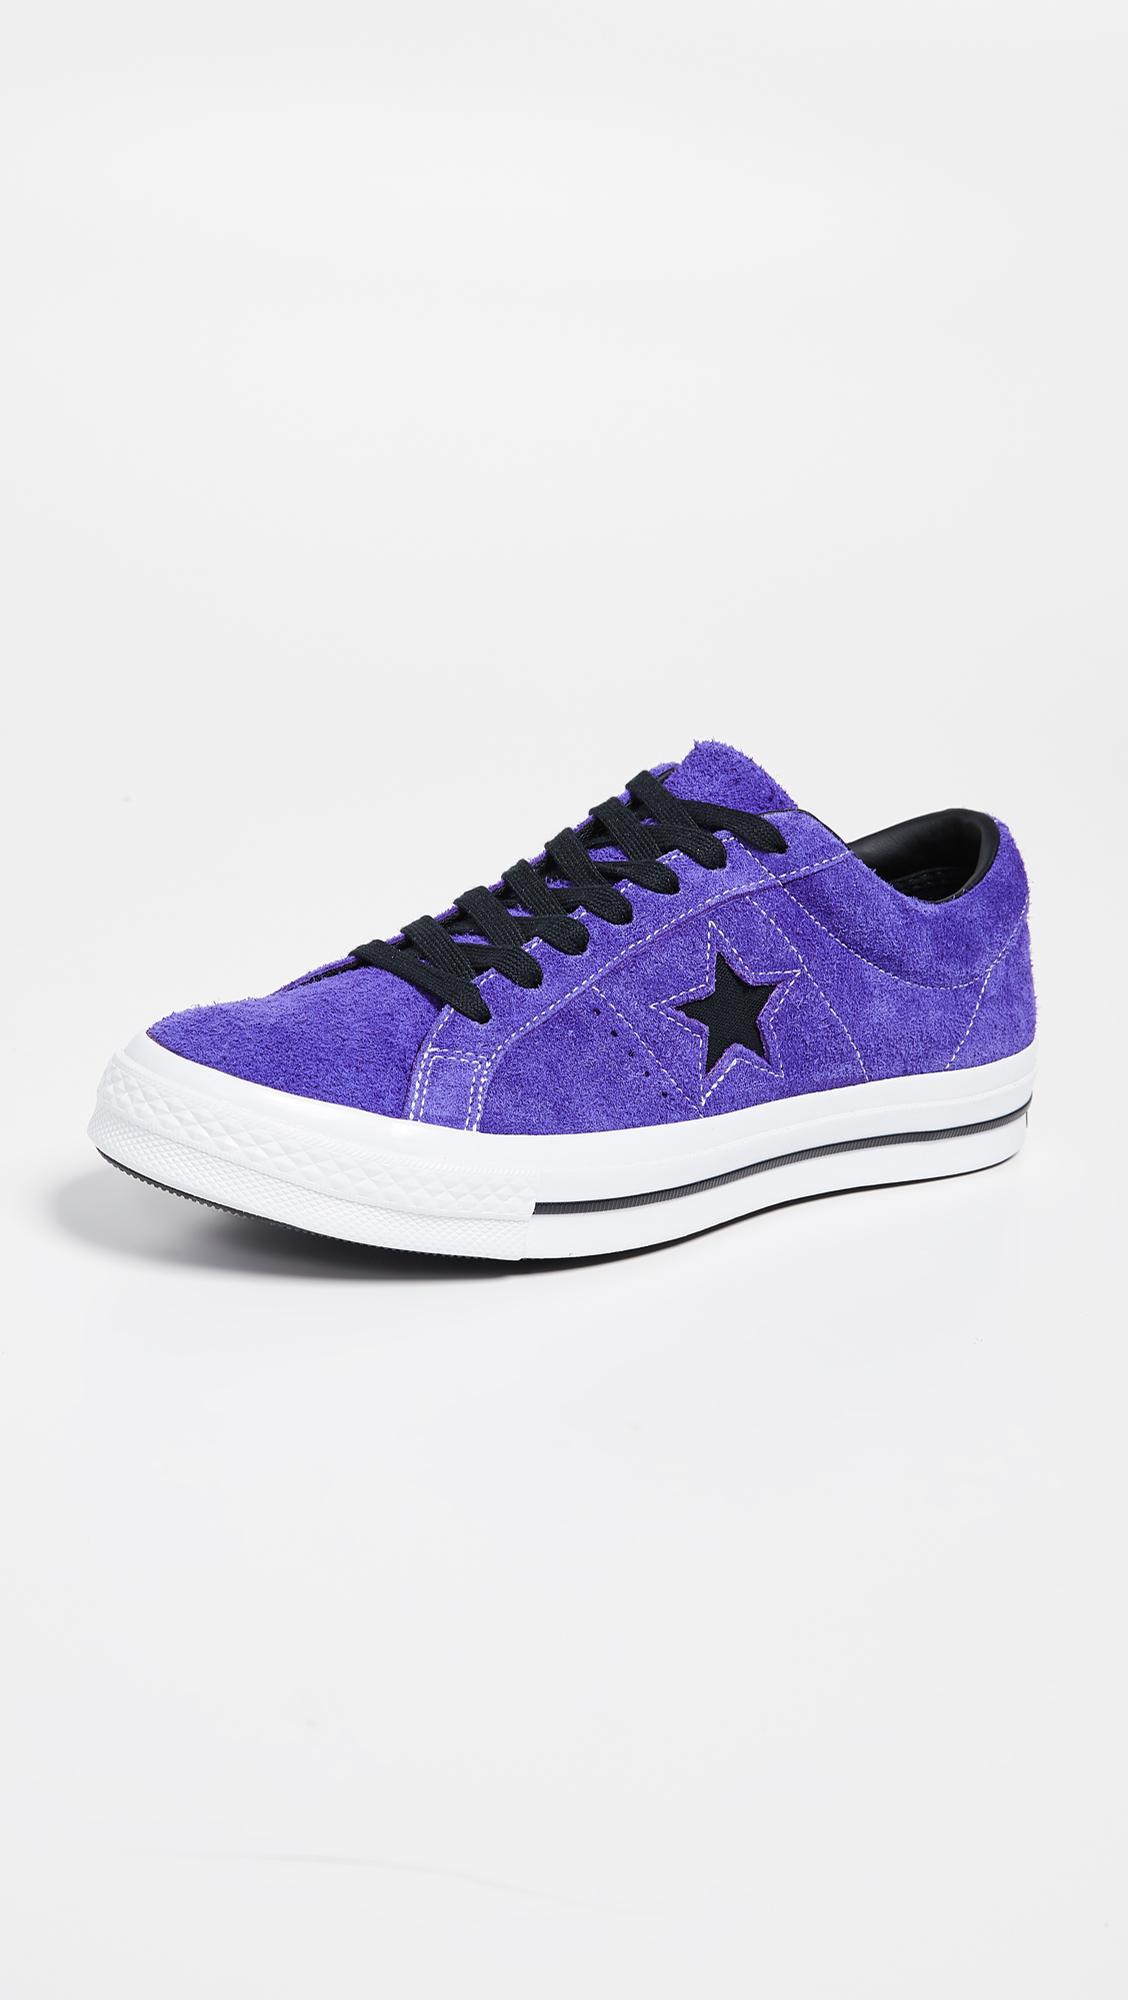 f44fabd834237a Converse Dark Star Vintage Suede Oxford Sneakers in Purple for Men ...